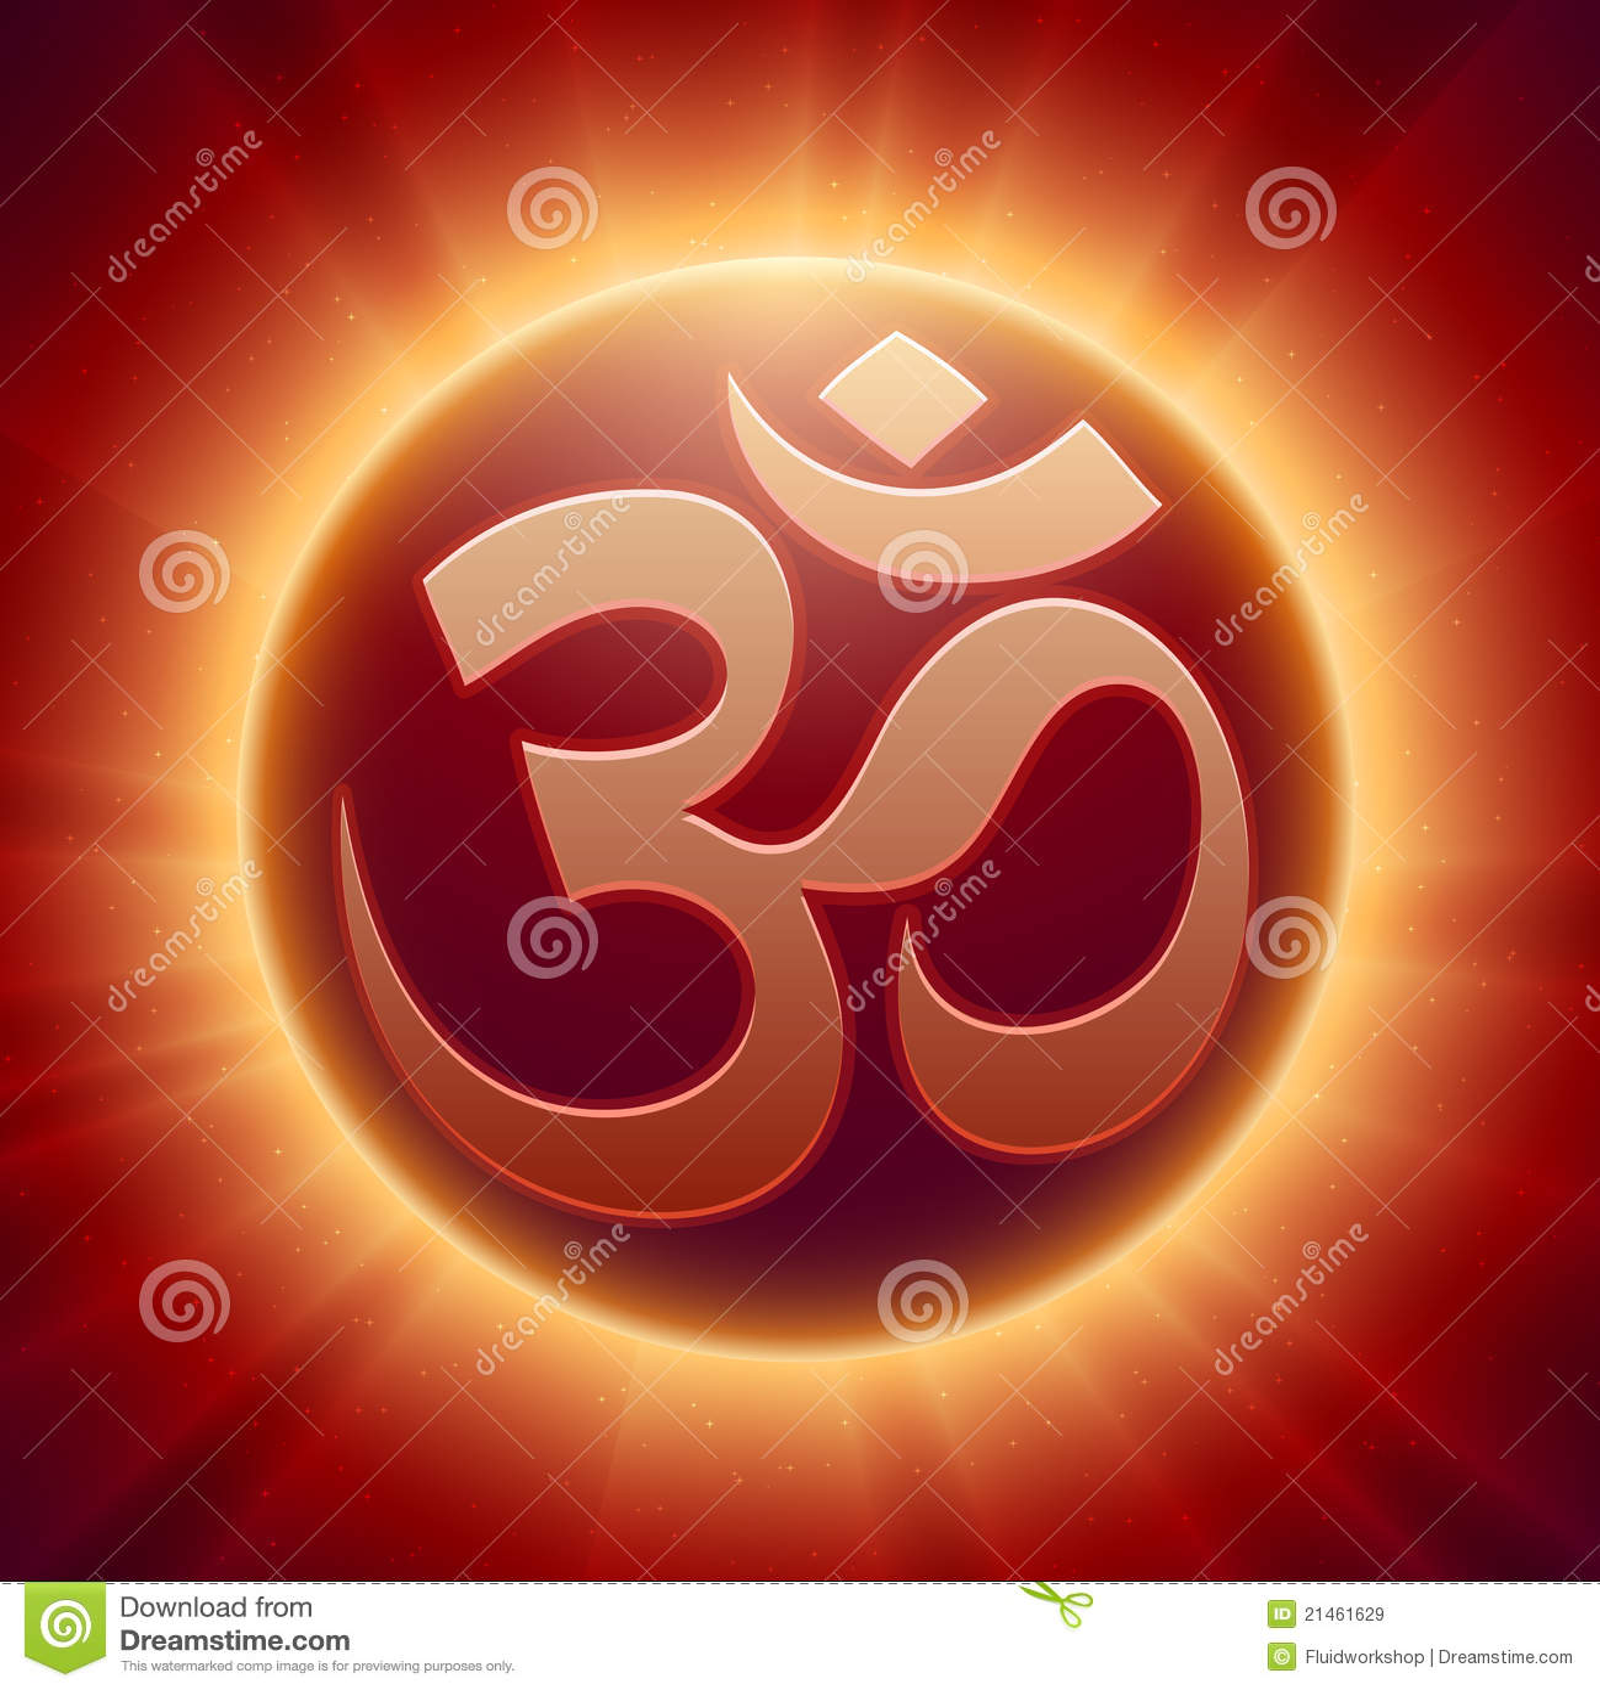 Mahadev Animated Wallpaper Vector Hindu Om Symbol Stock Vector Image Of Karma Clean